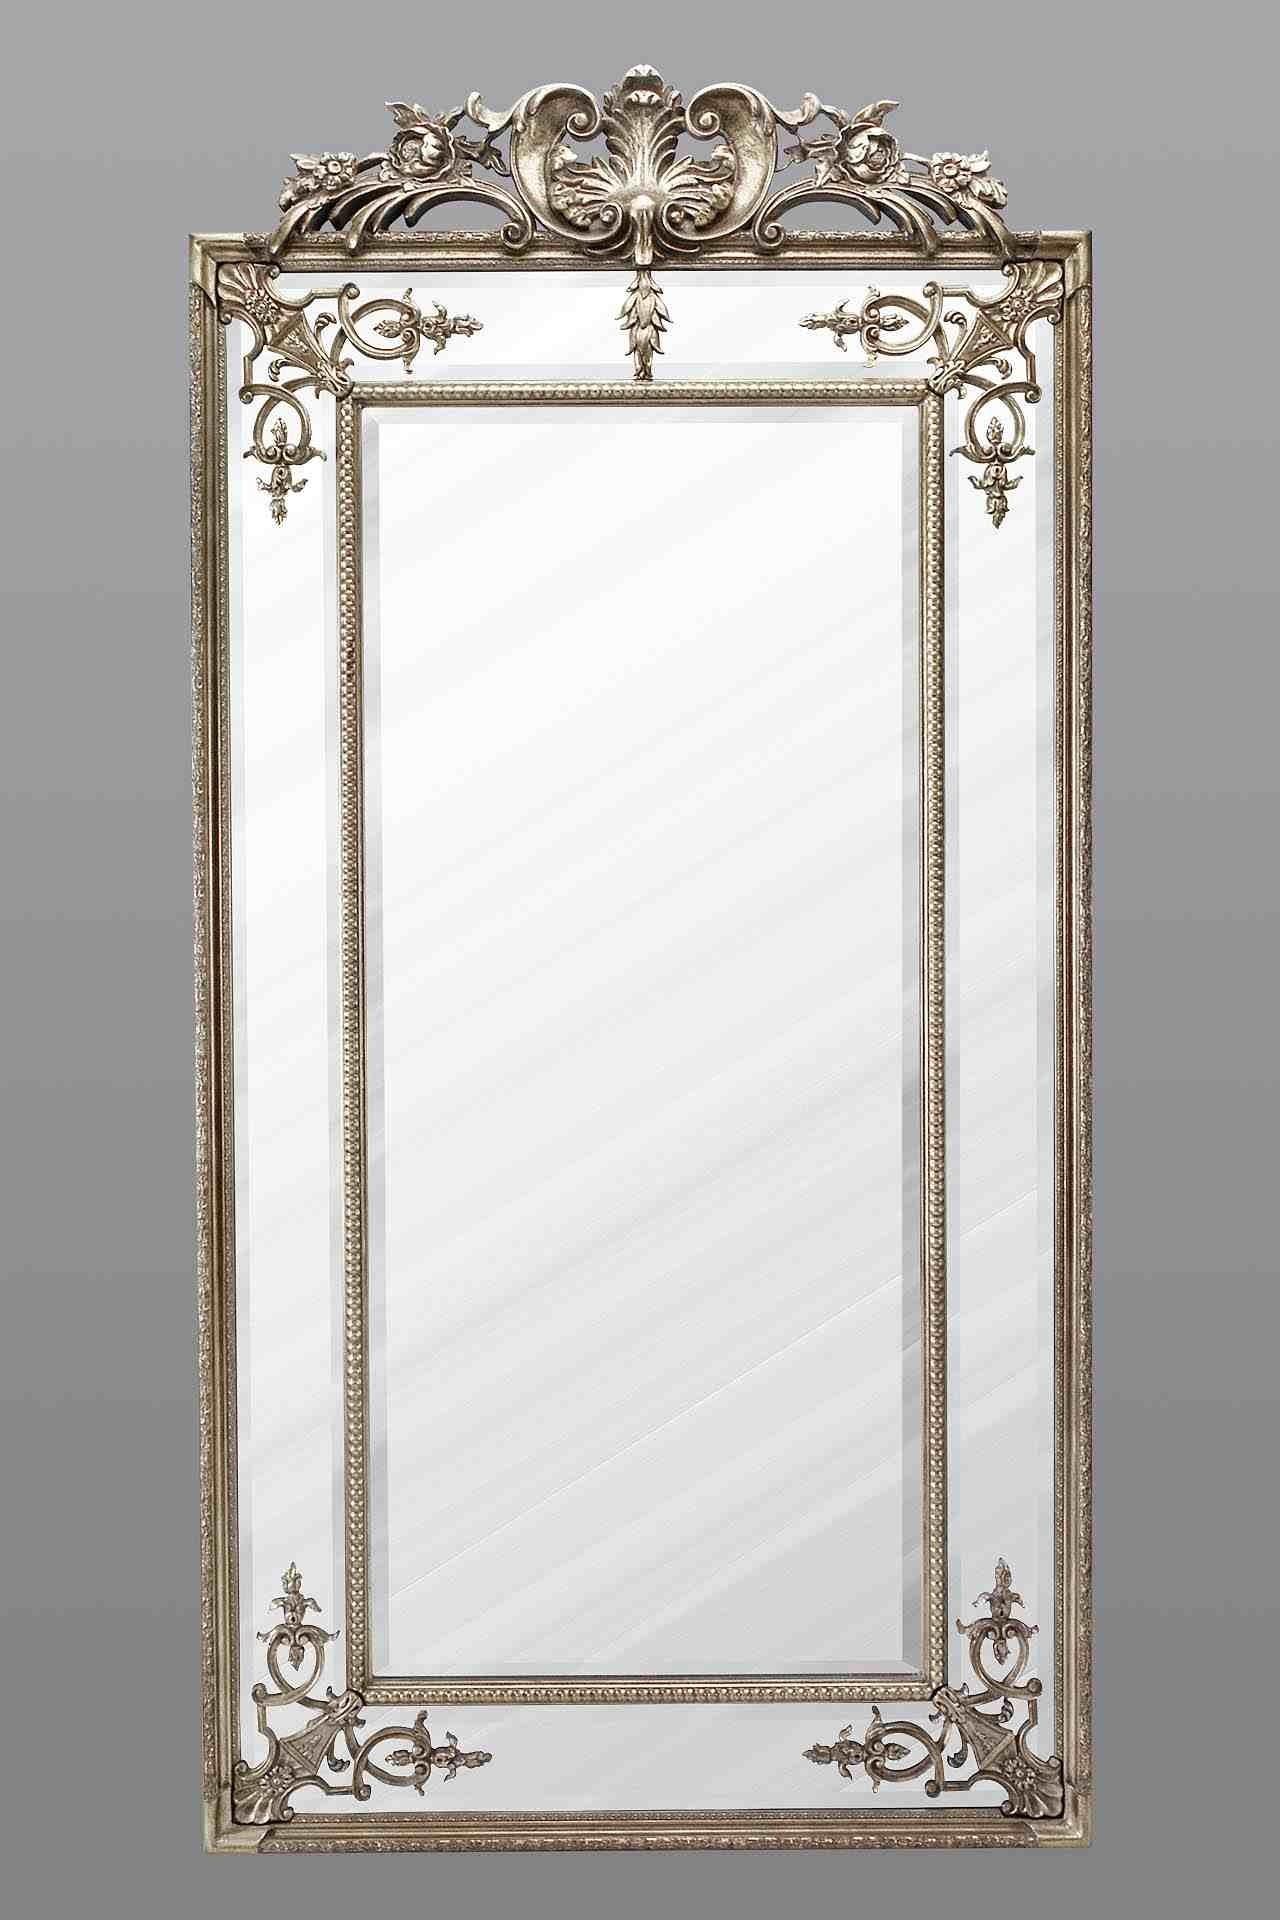 Large Full Length Mirror Silver Regarding Full Length Silver Mirror (View 5 of 15)